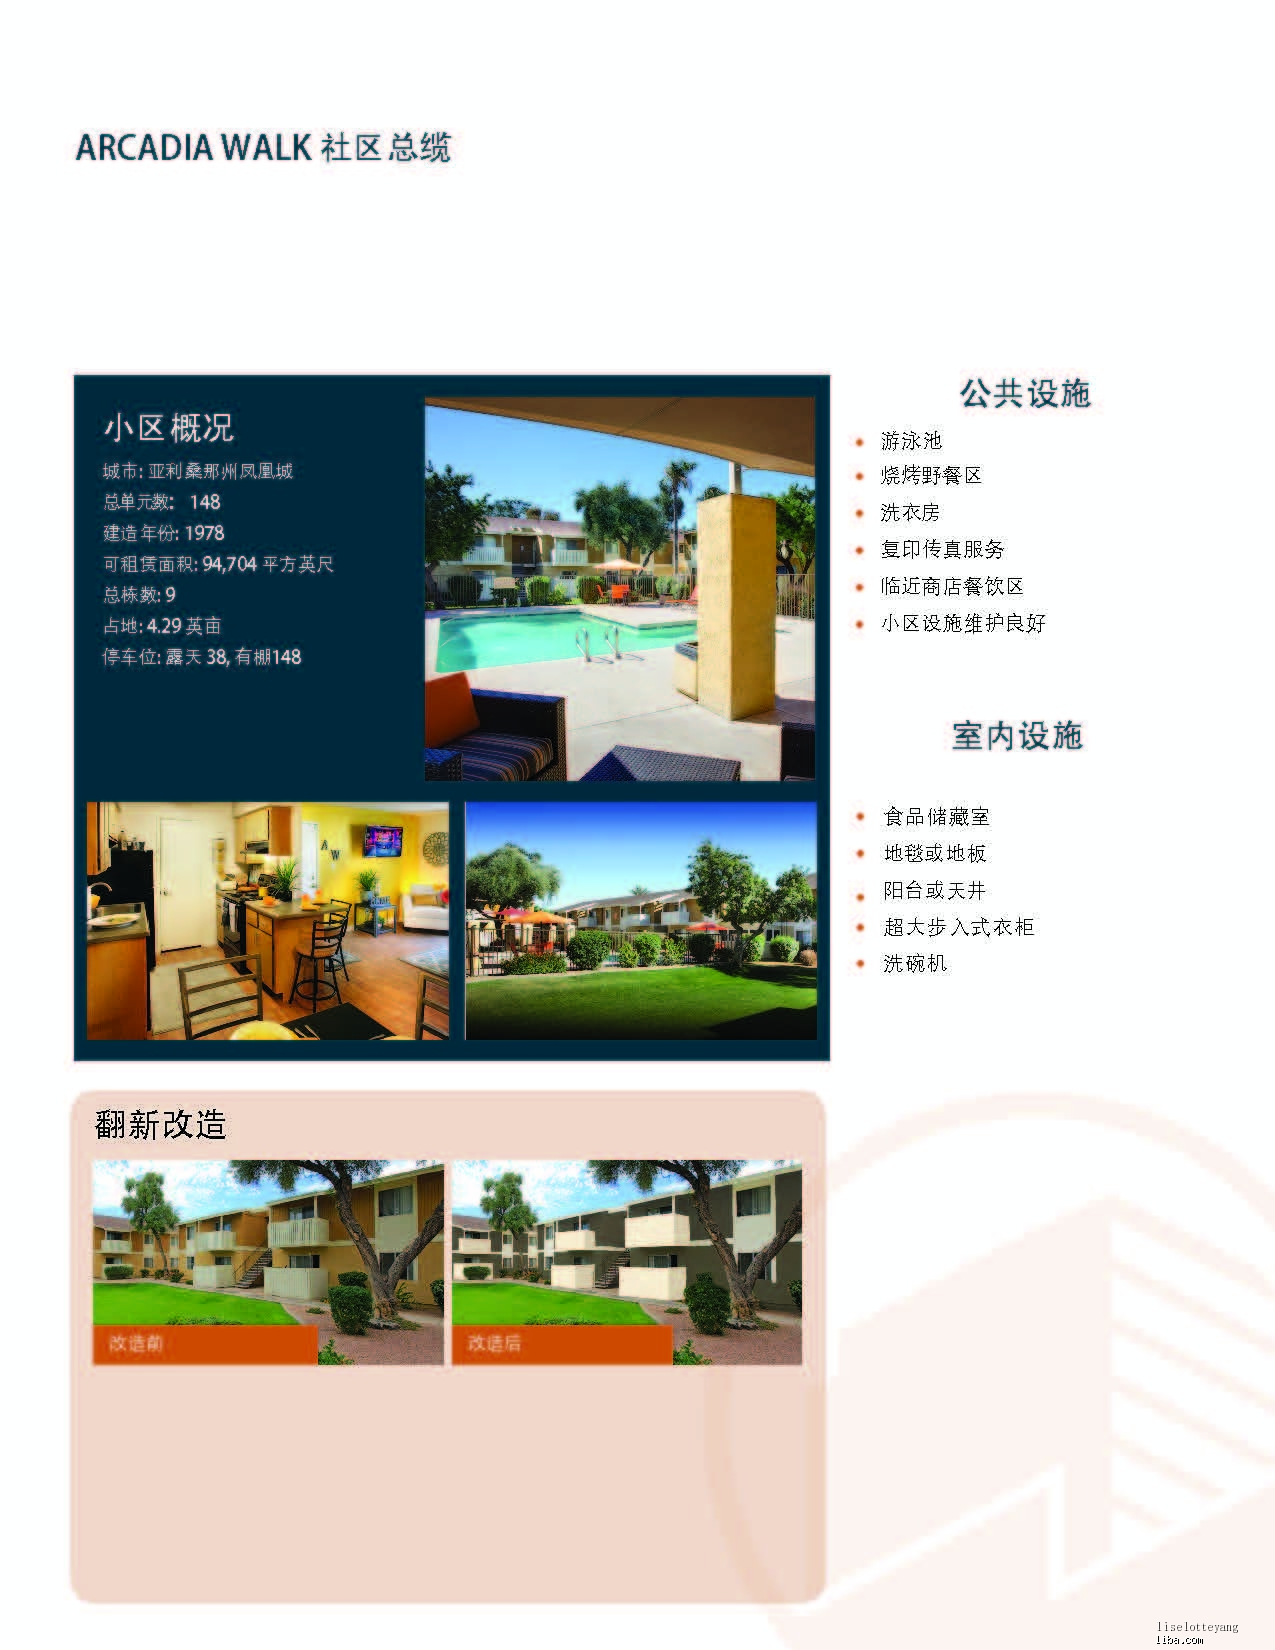 Arcadia Walk 中文 4.jpg